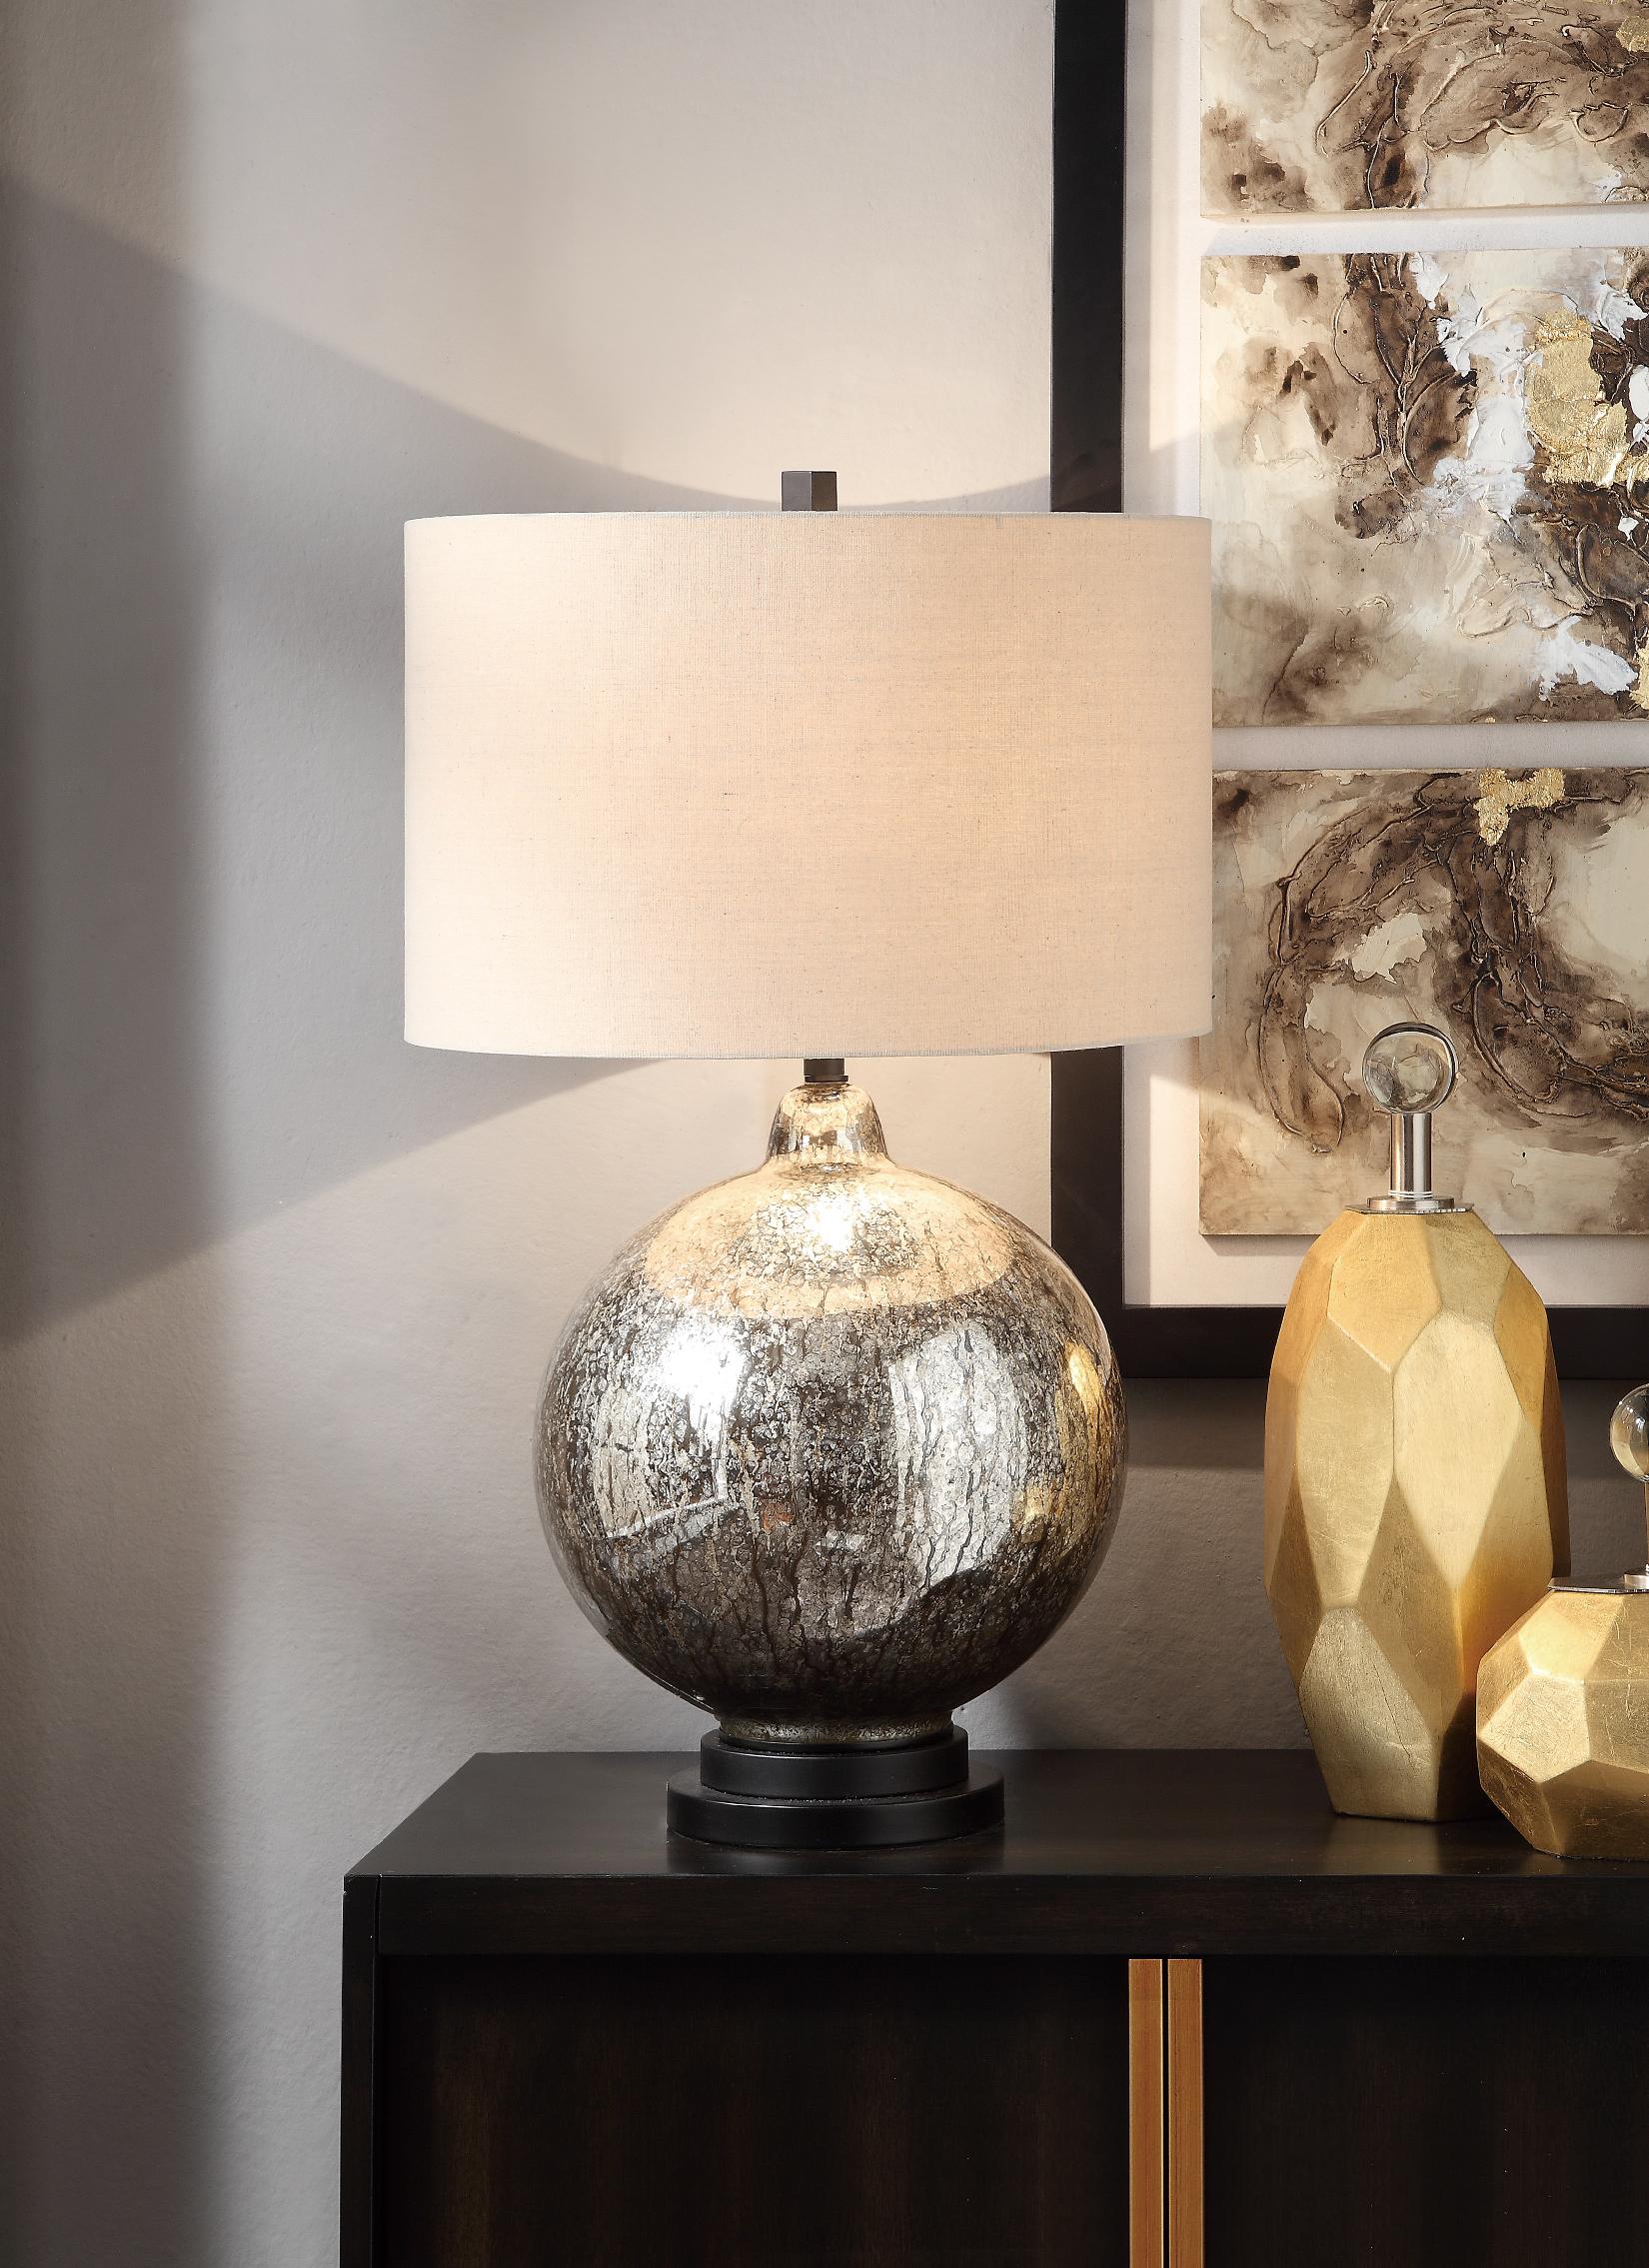 NEW Pair of Mottled Mercury Glass Lamps